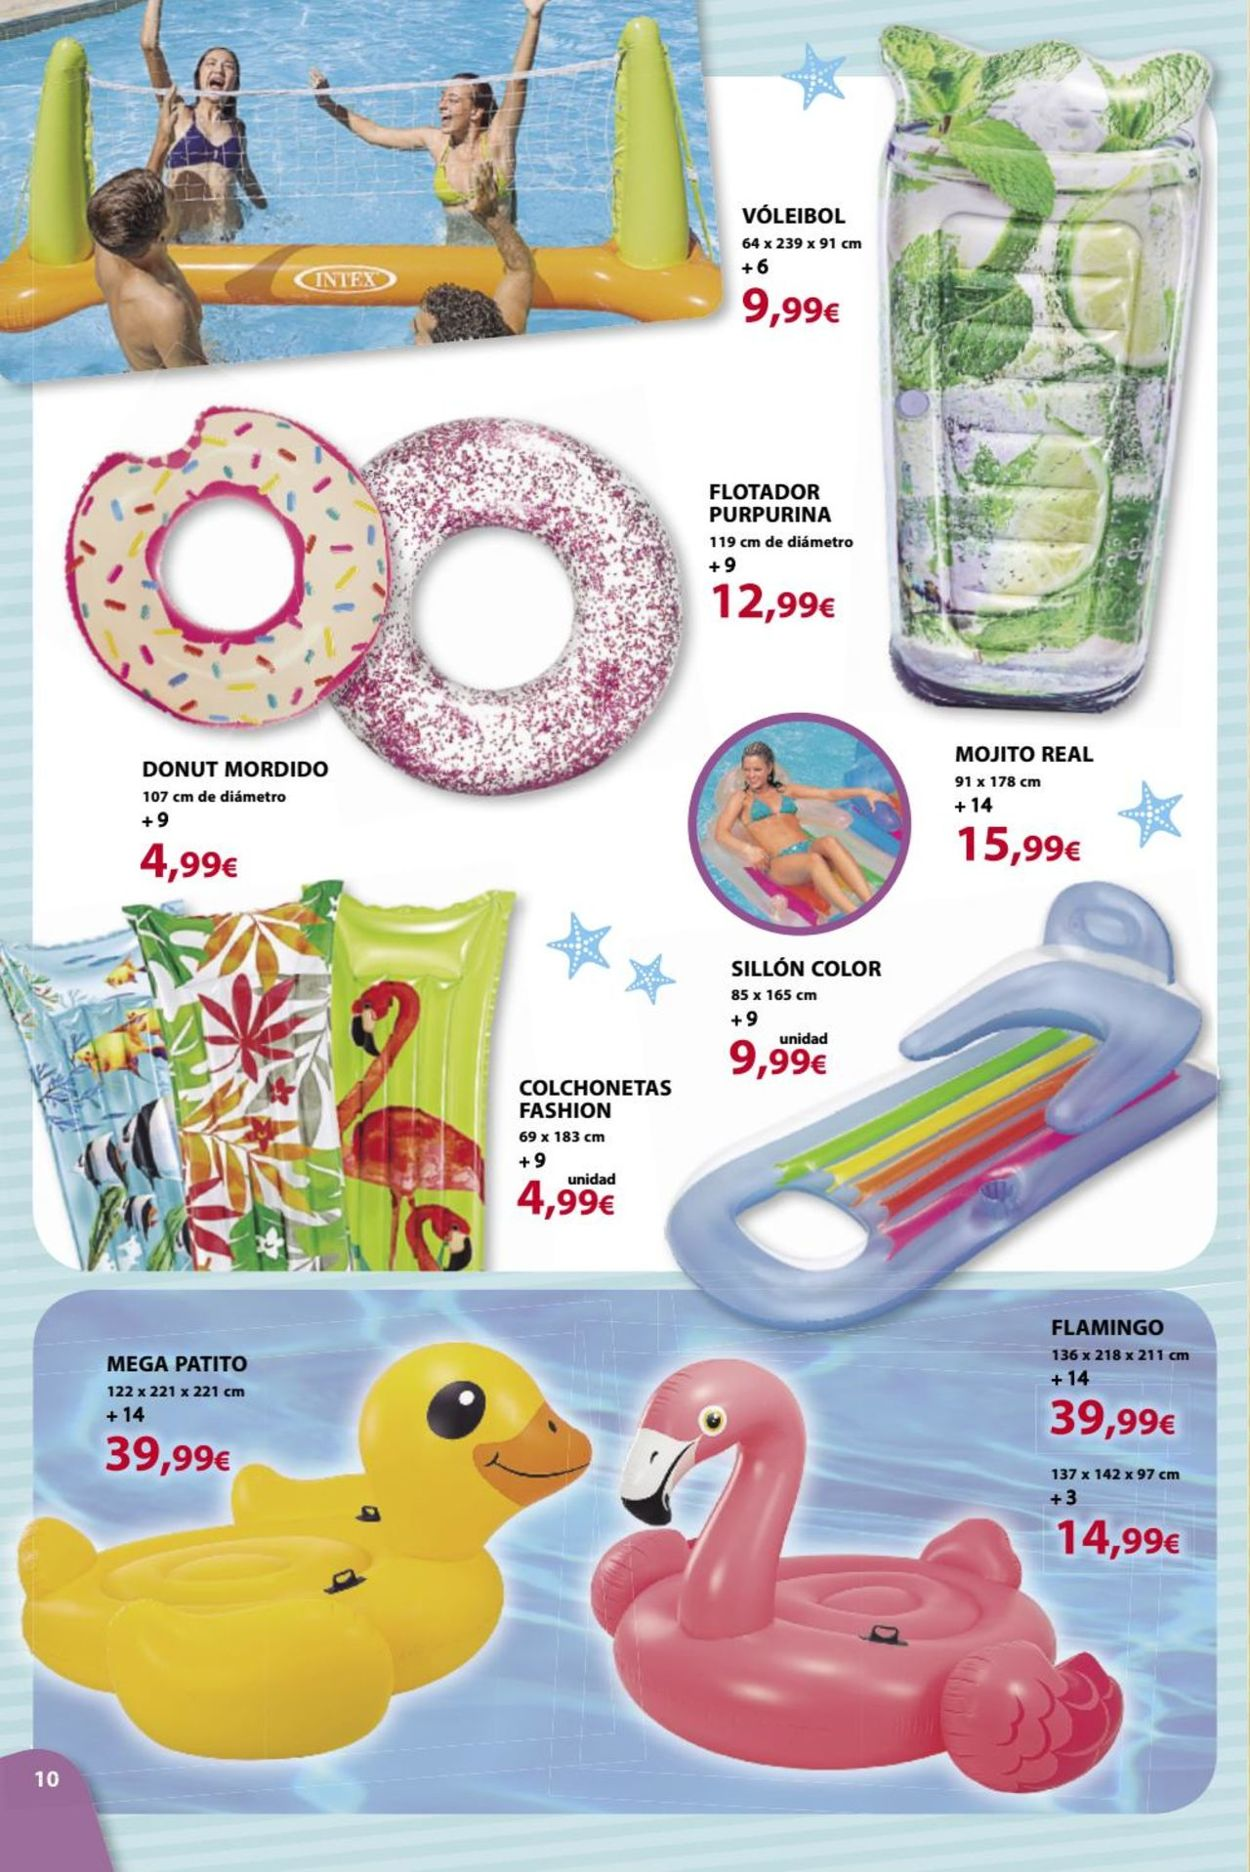 Toy Planet Folleto - 08.06-31.07.2019 (Página 10)